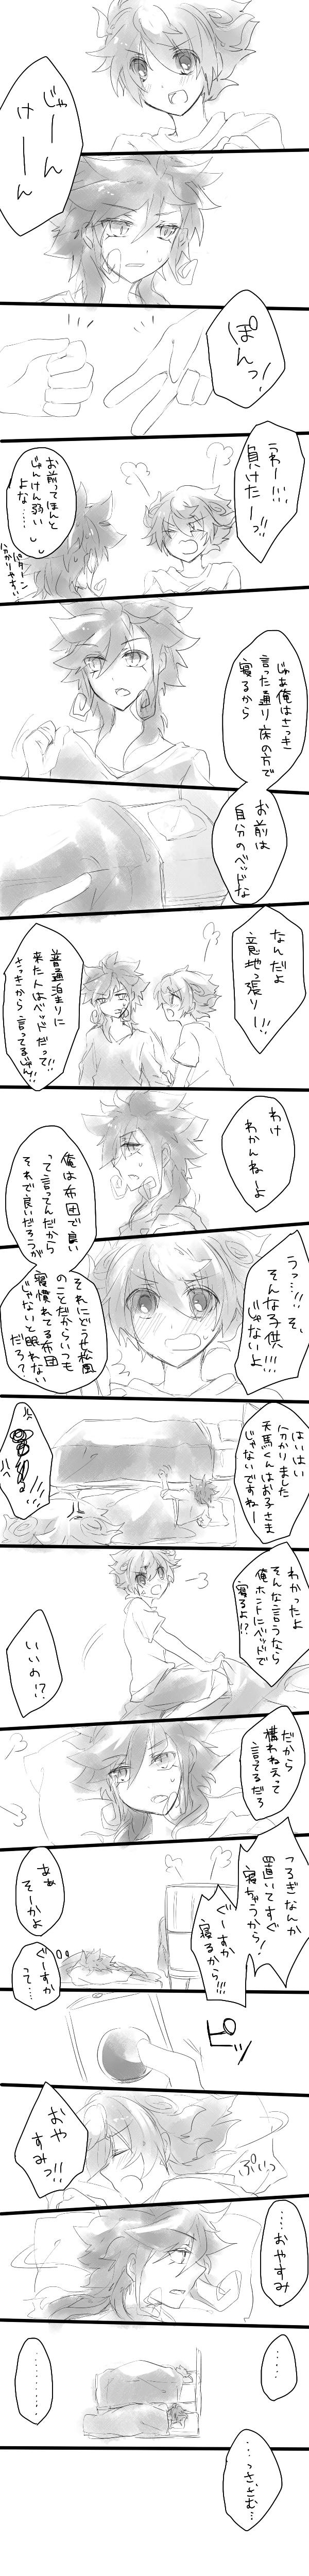 Tags: Anime, Level-5, Inazuma Eleven GO, Tsurugi Kyousuke, Matsukaze Tenma